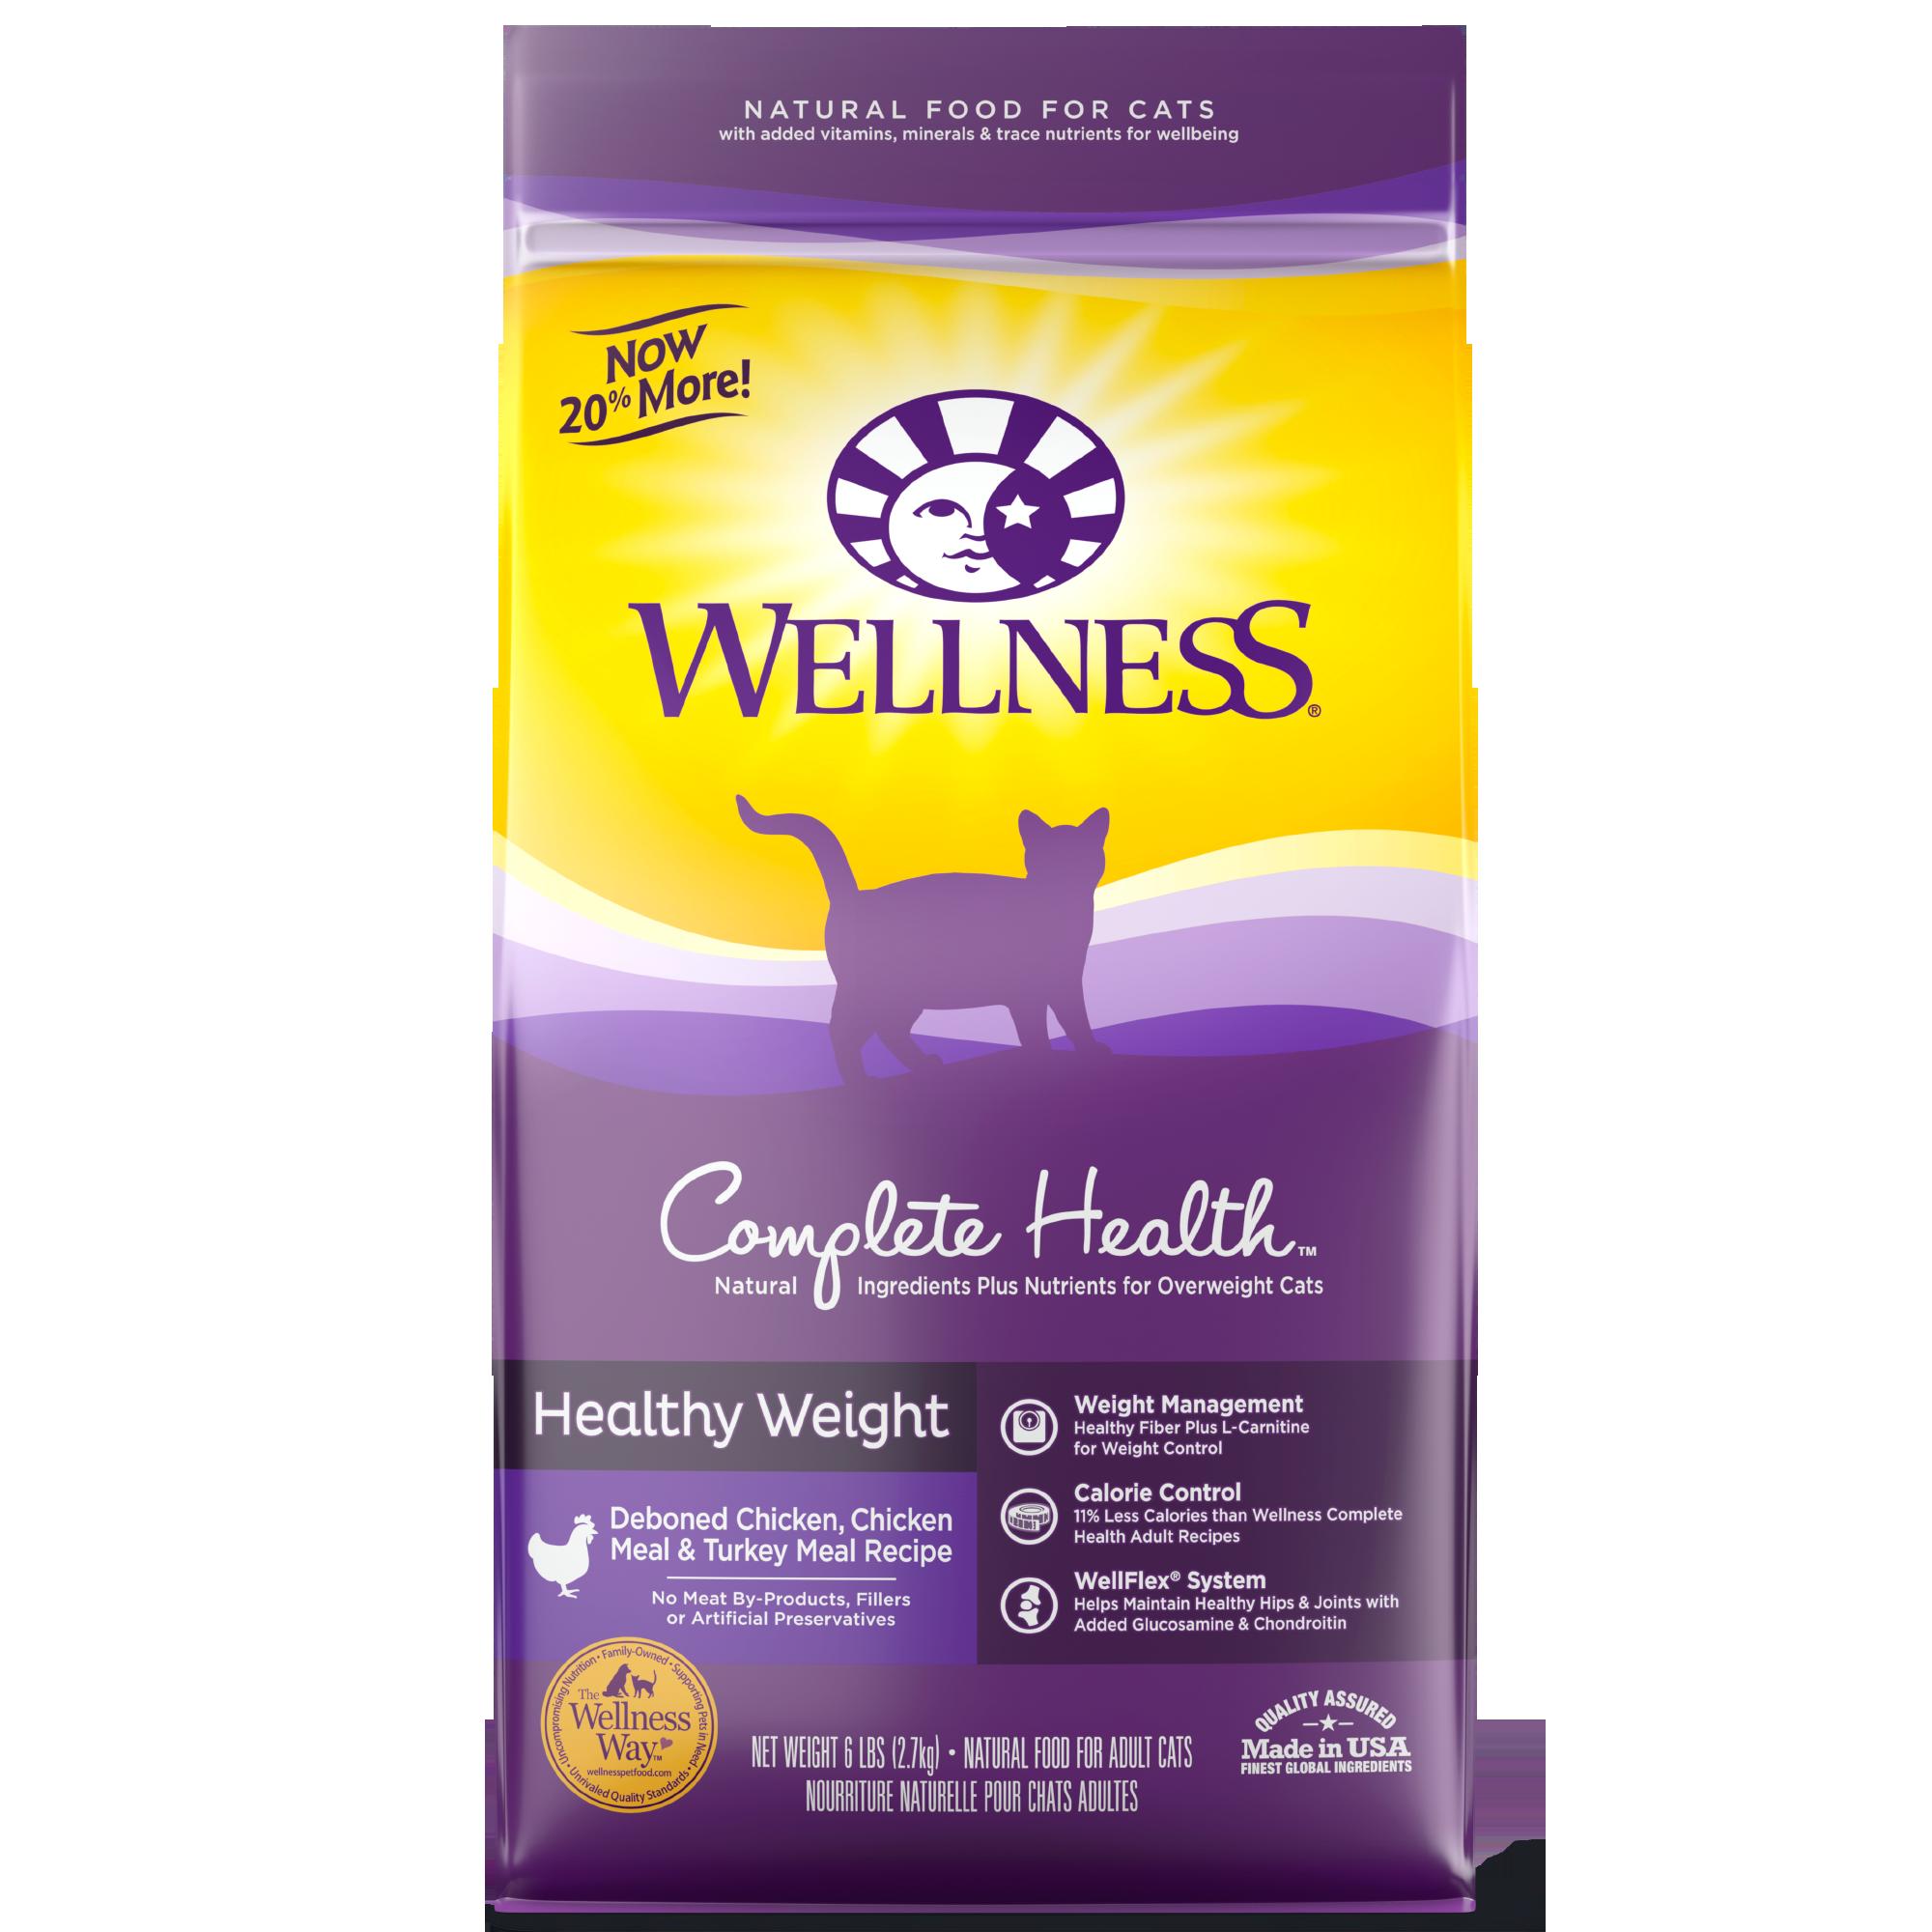 Wellness Complete Health Healthy Weight, Deboned Chicken & Turkey Meal Recipe Dry Cat Food, 12-lb bag